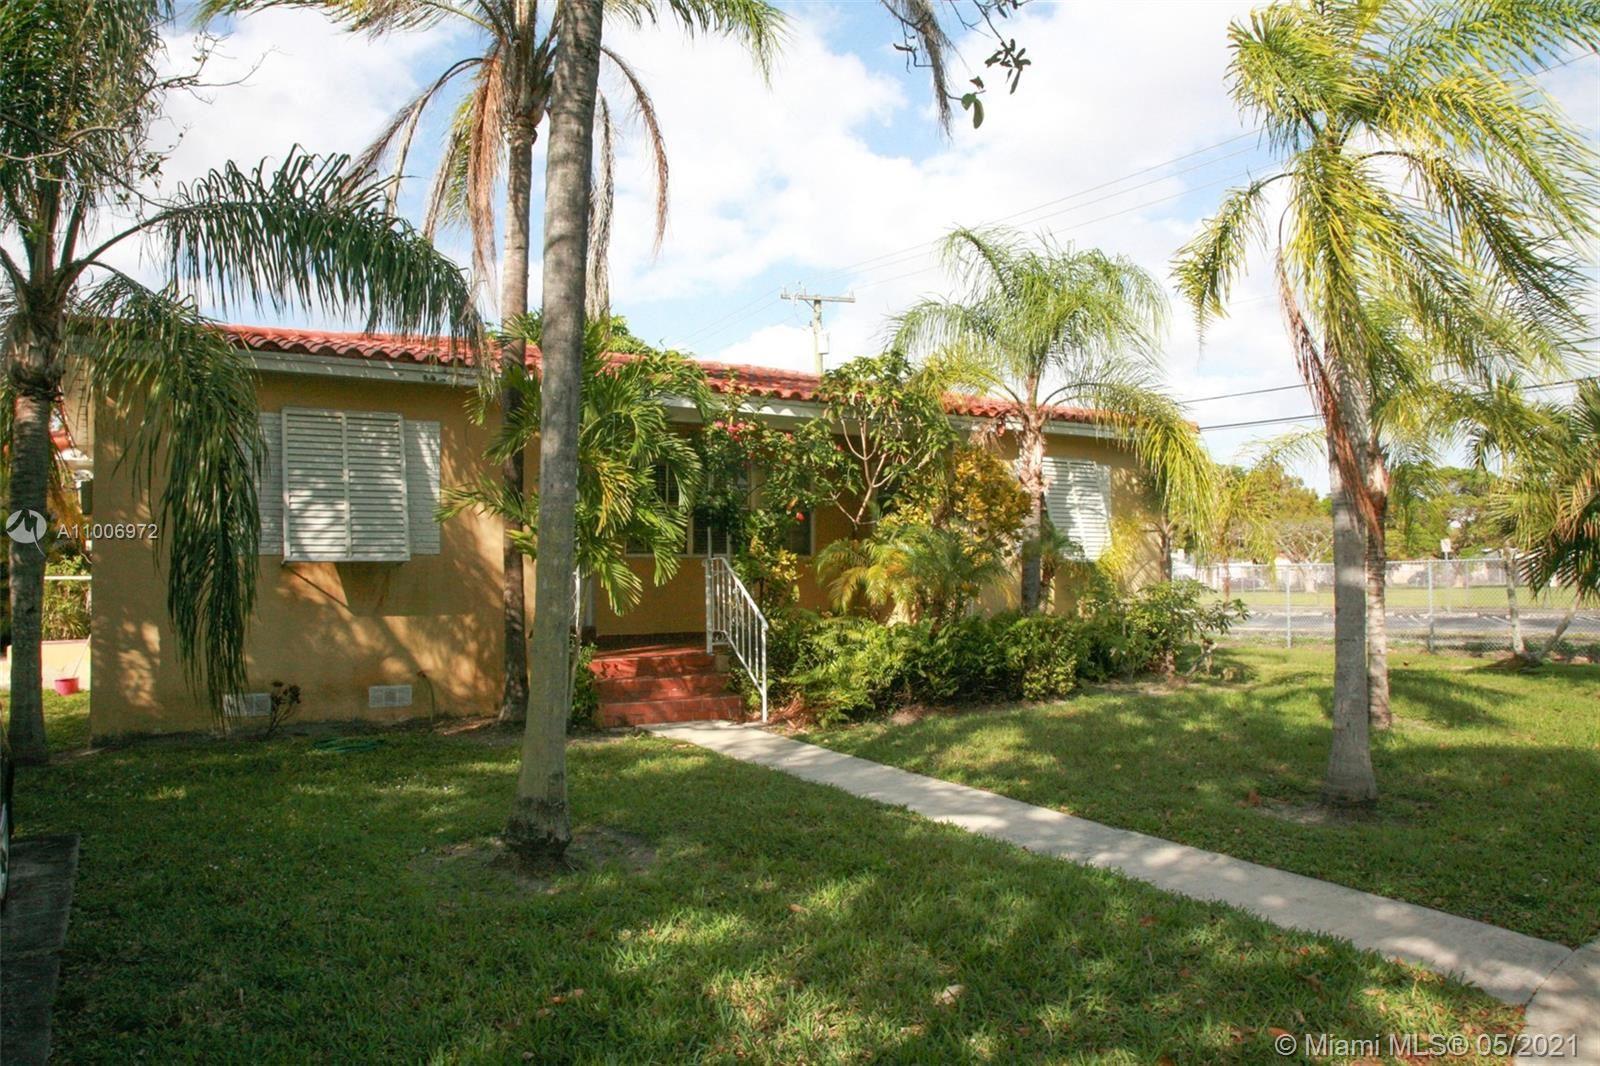 6007 SW 15th St, West Miami, FL 33144 - #: A11006972